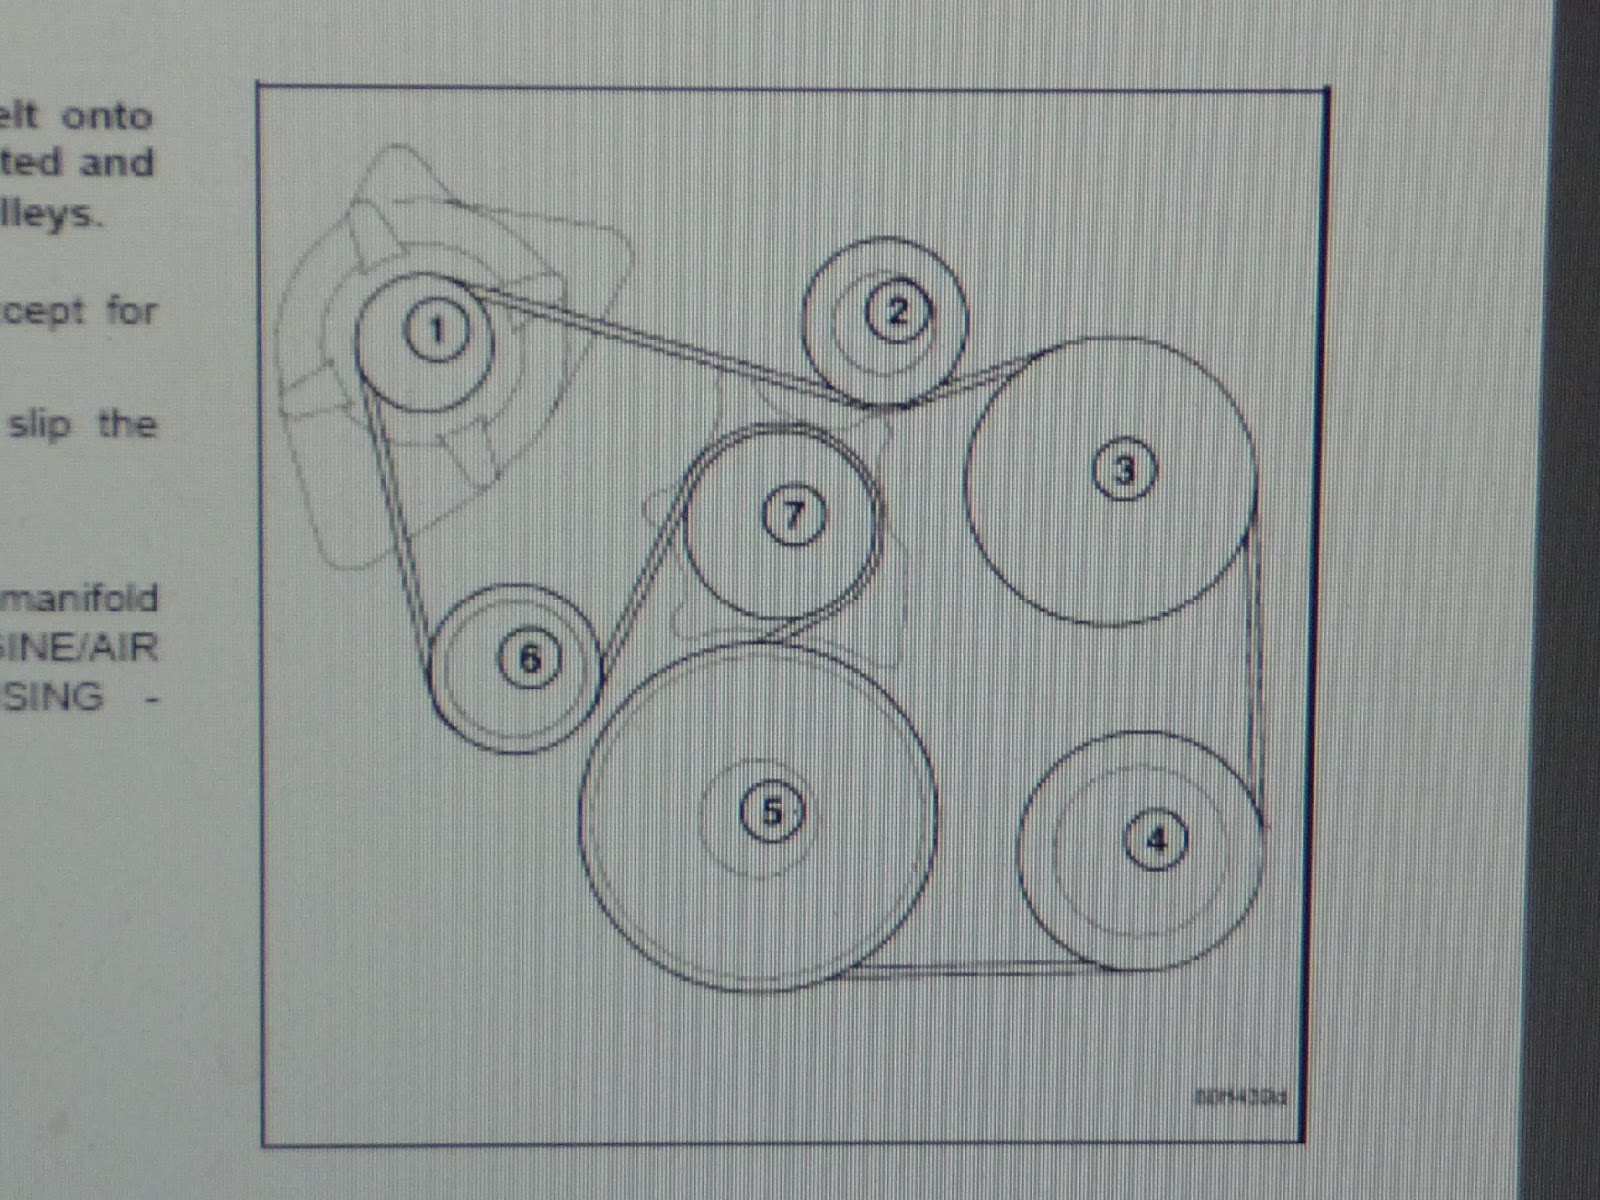 dodge ram belt diagram1 [ 1600 x 1200 Pixel ]